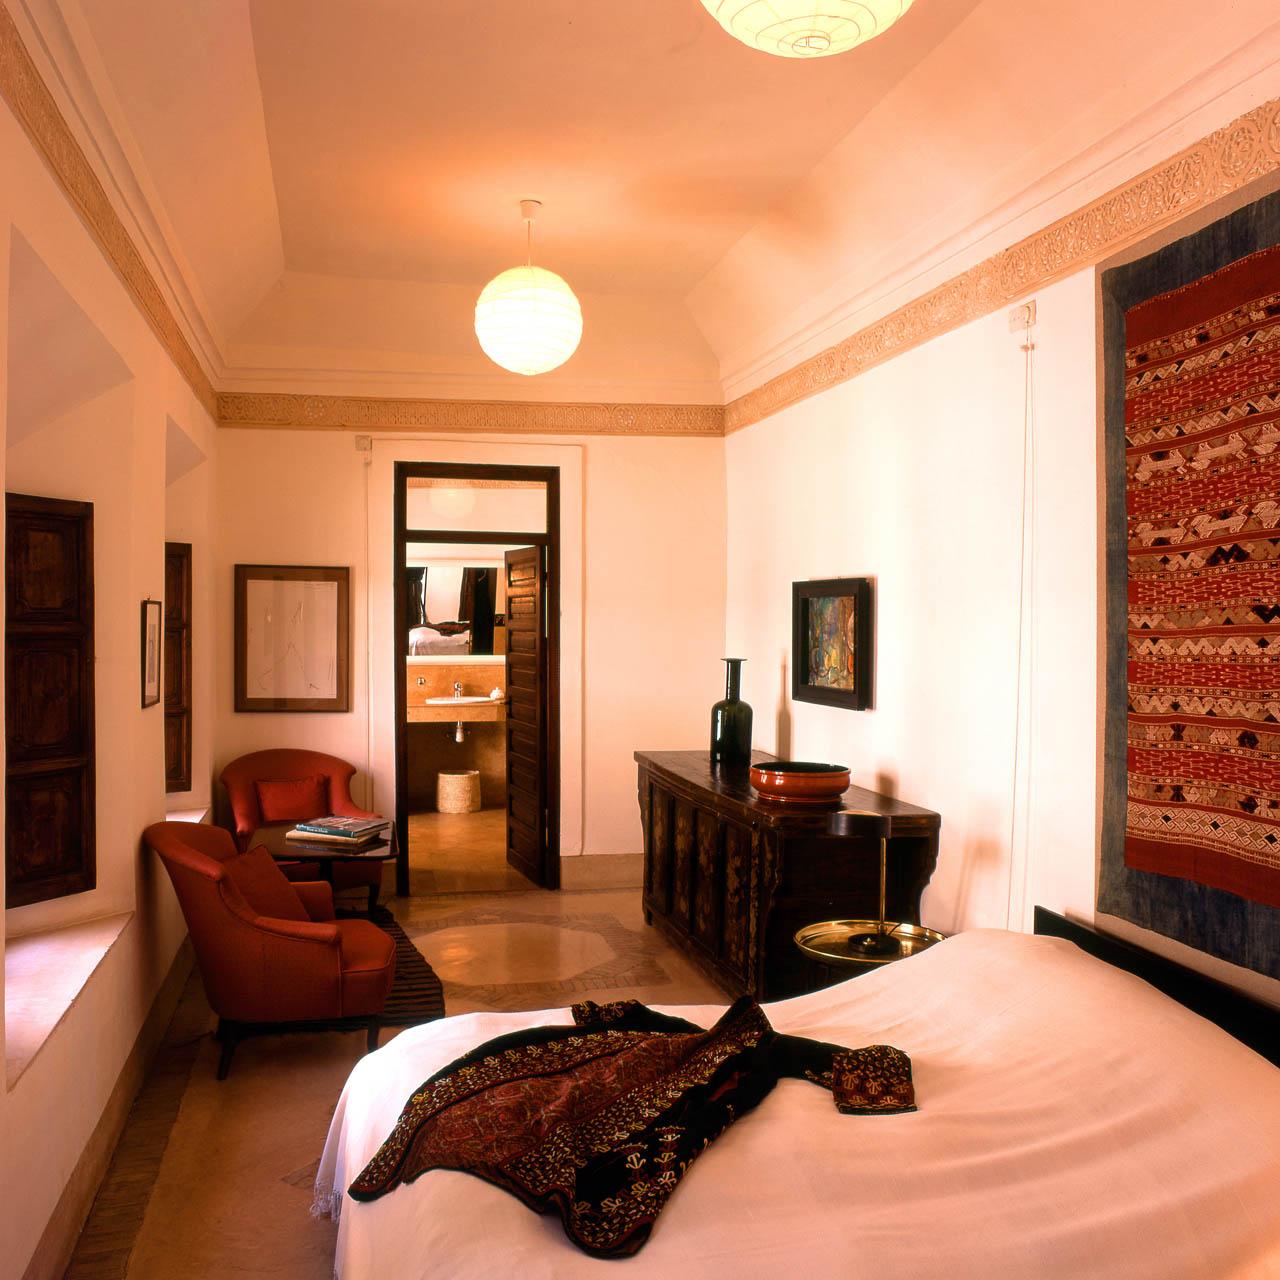 Chambre avec décor chinois